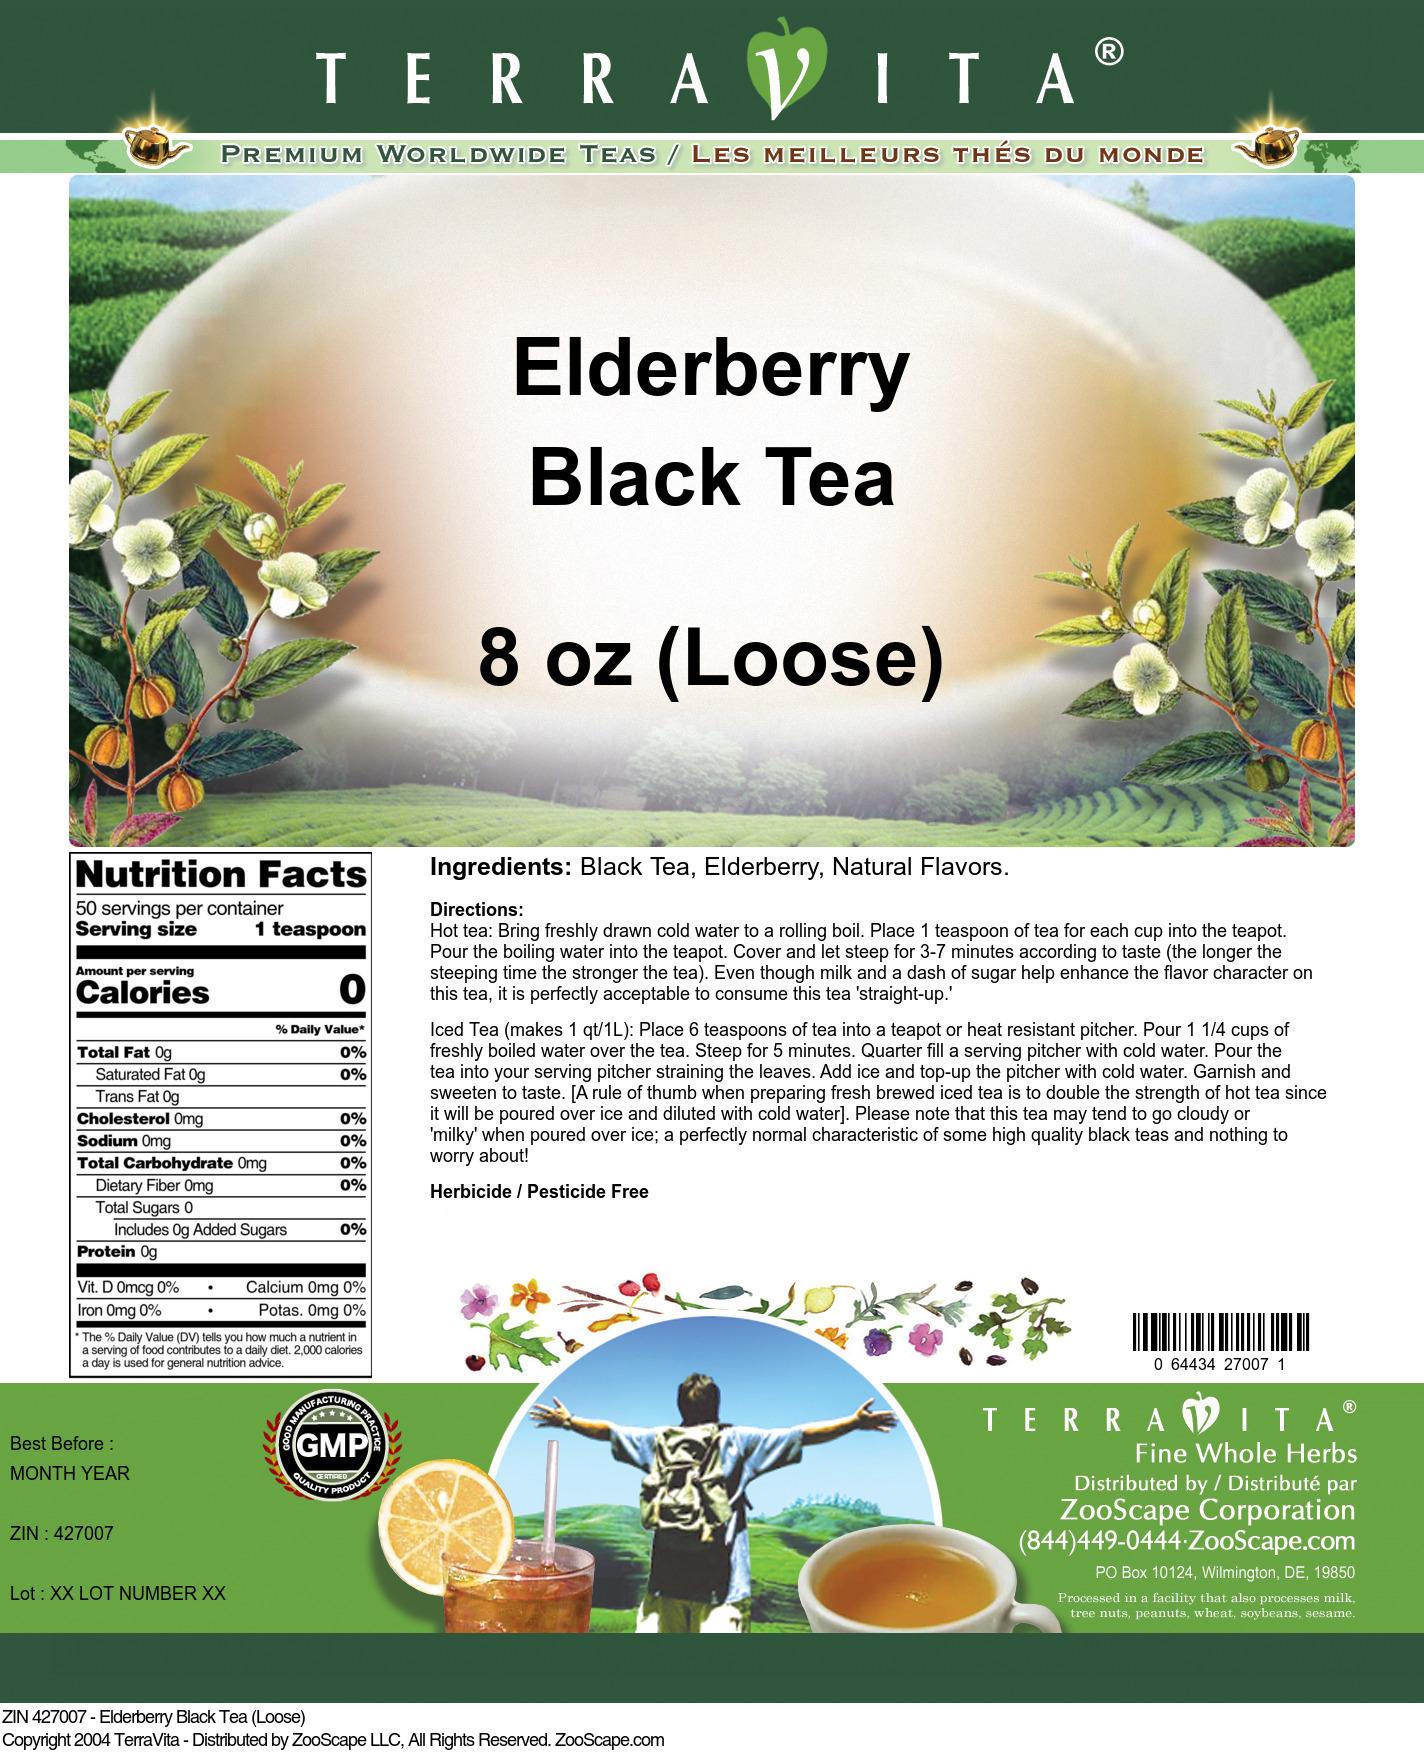 Elderberry Black Tea (Loose)